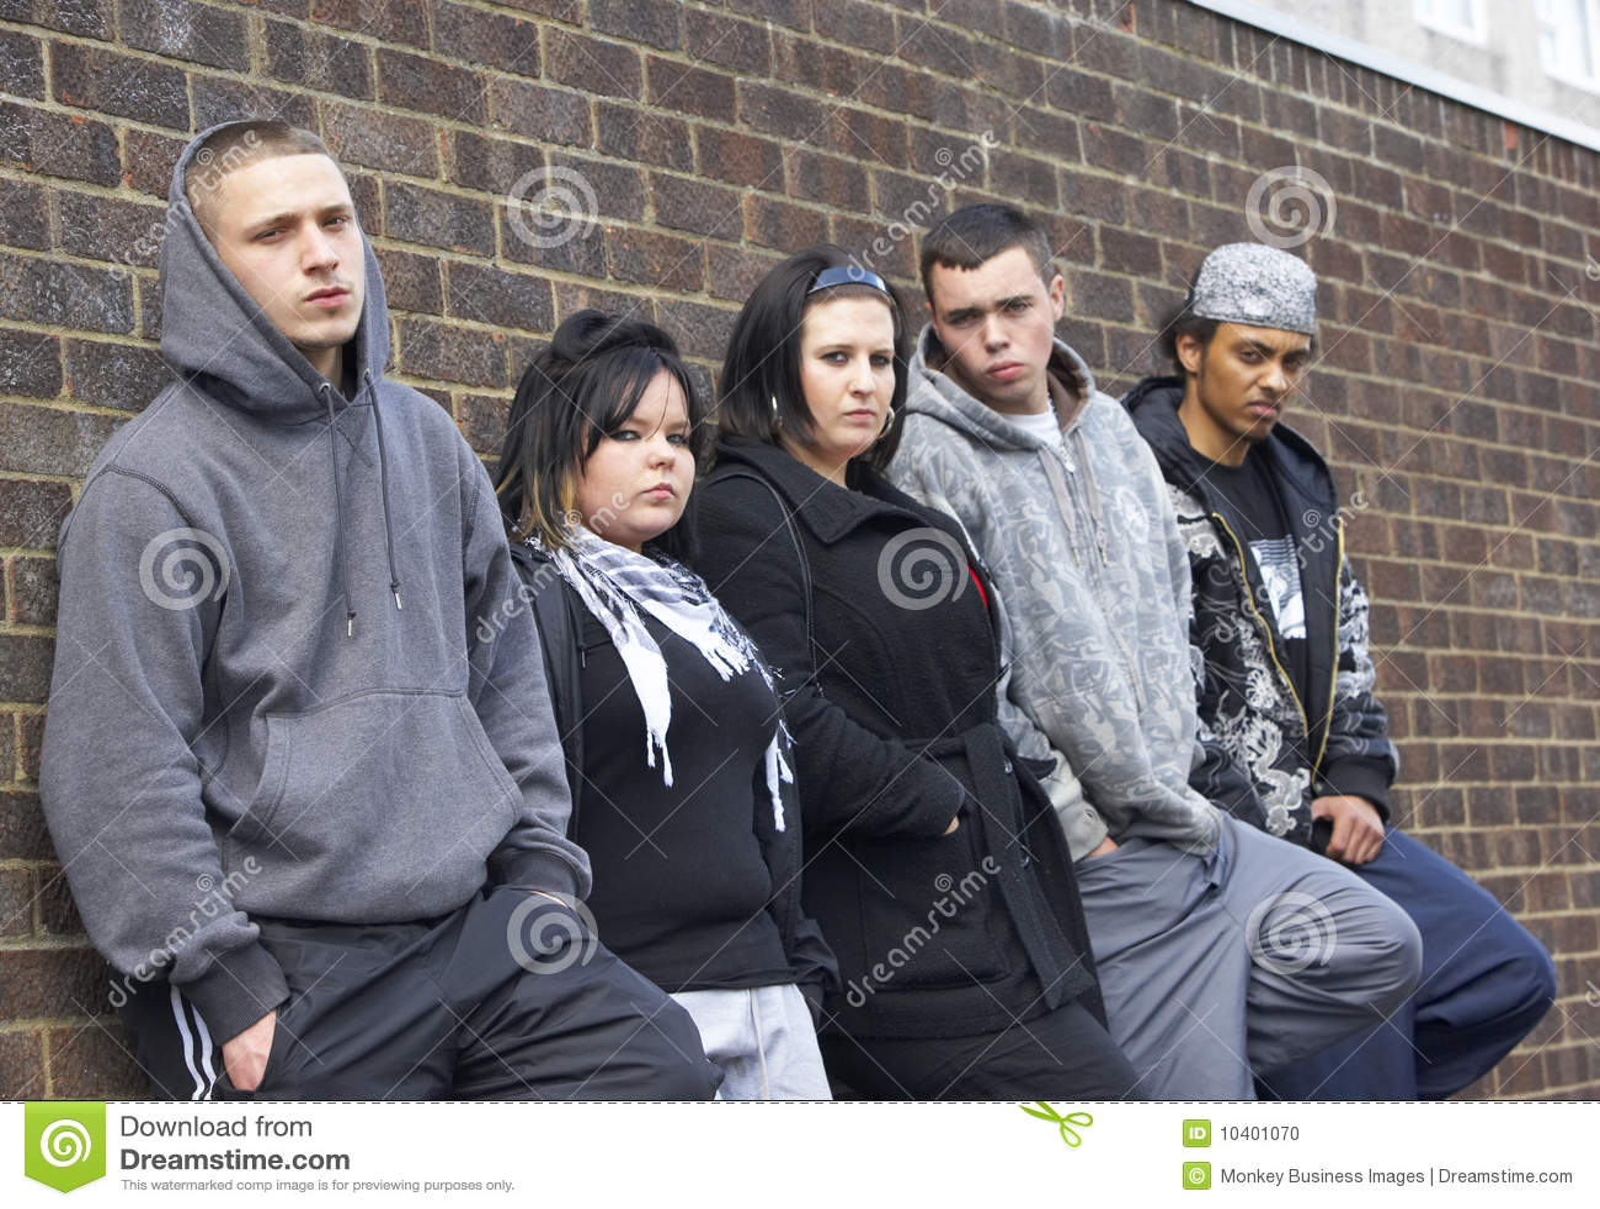 hispanic adolescent youth gangs essay